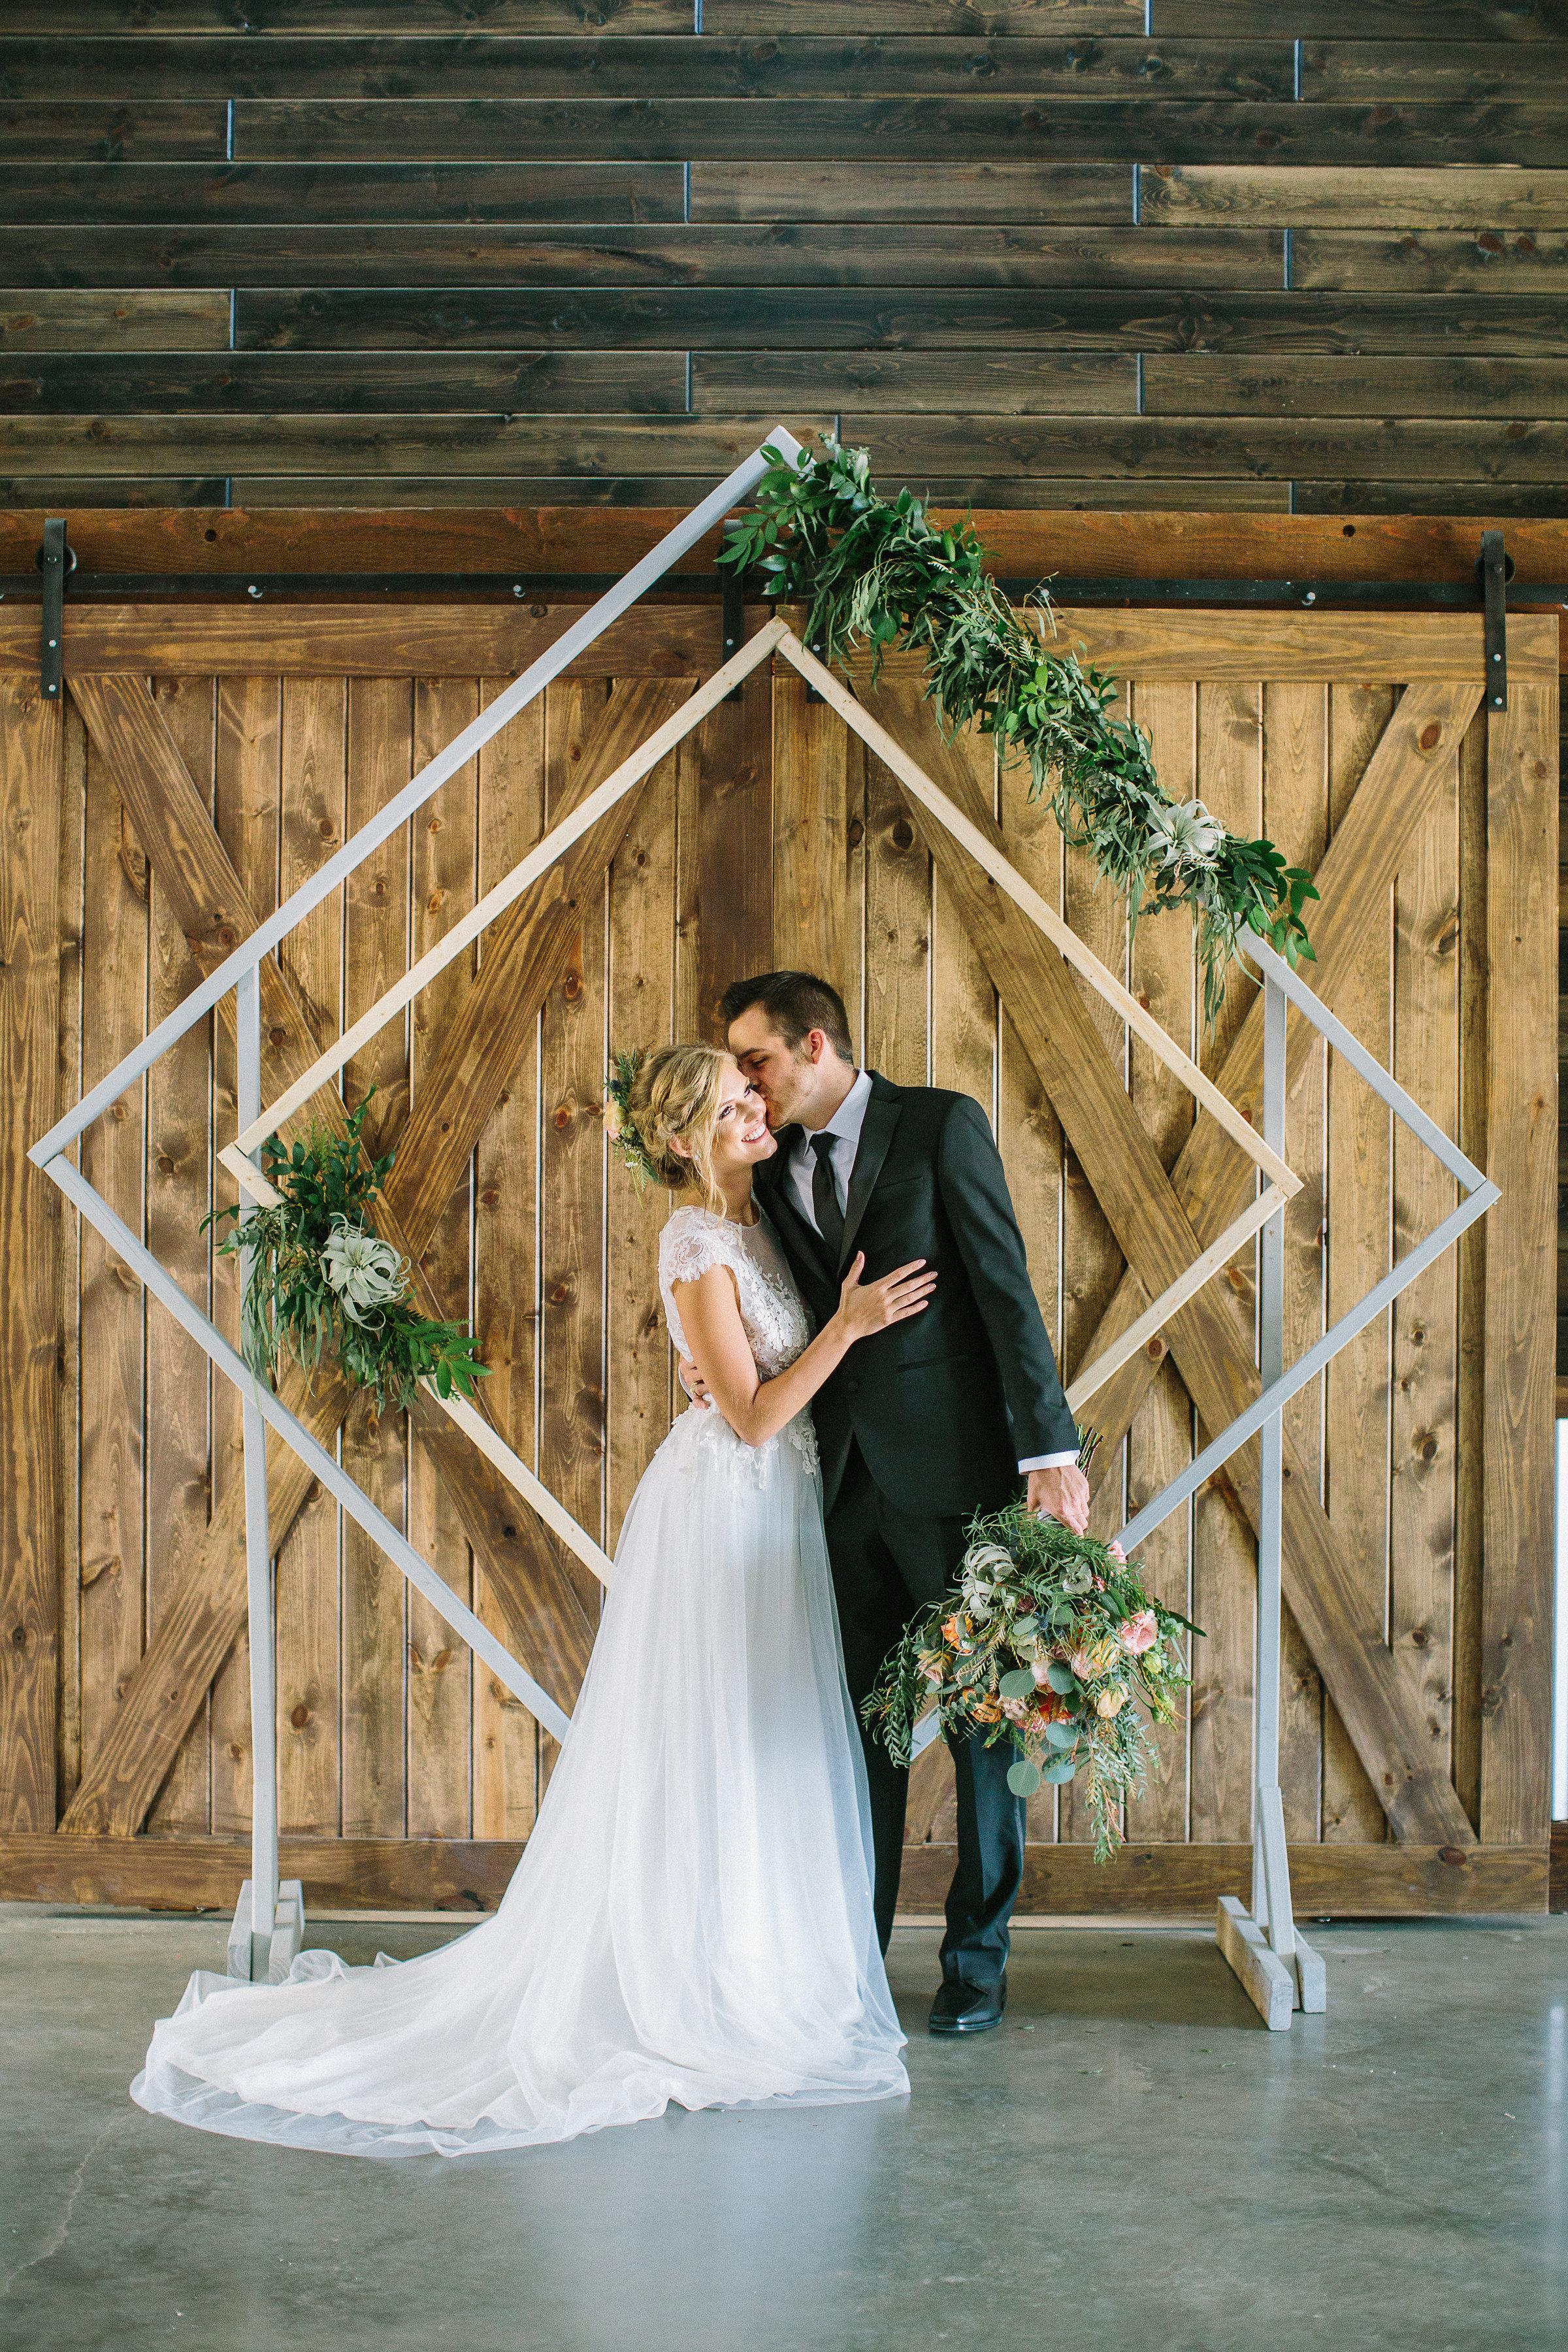 Ellen-Ashton-Photography-Peach-Creek-Ranch-Weddings-Wed-and-Prosper177